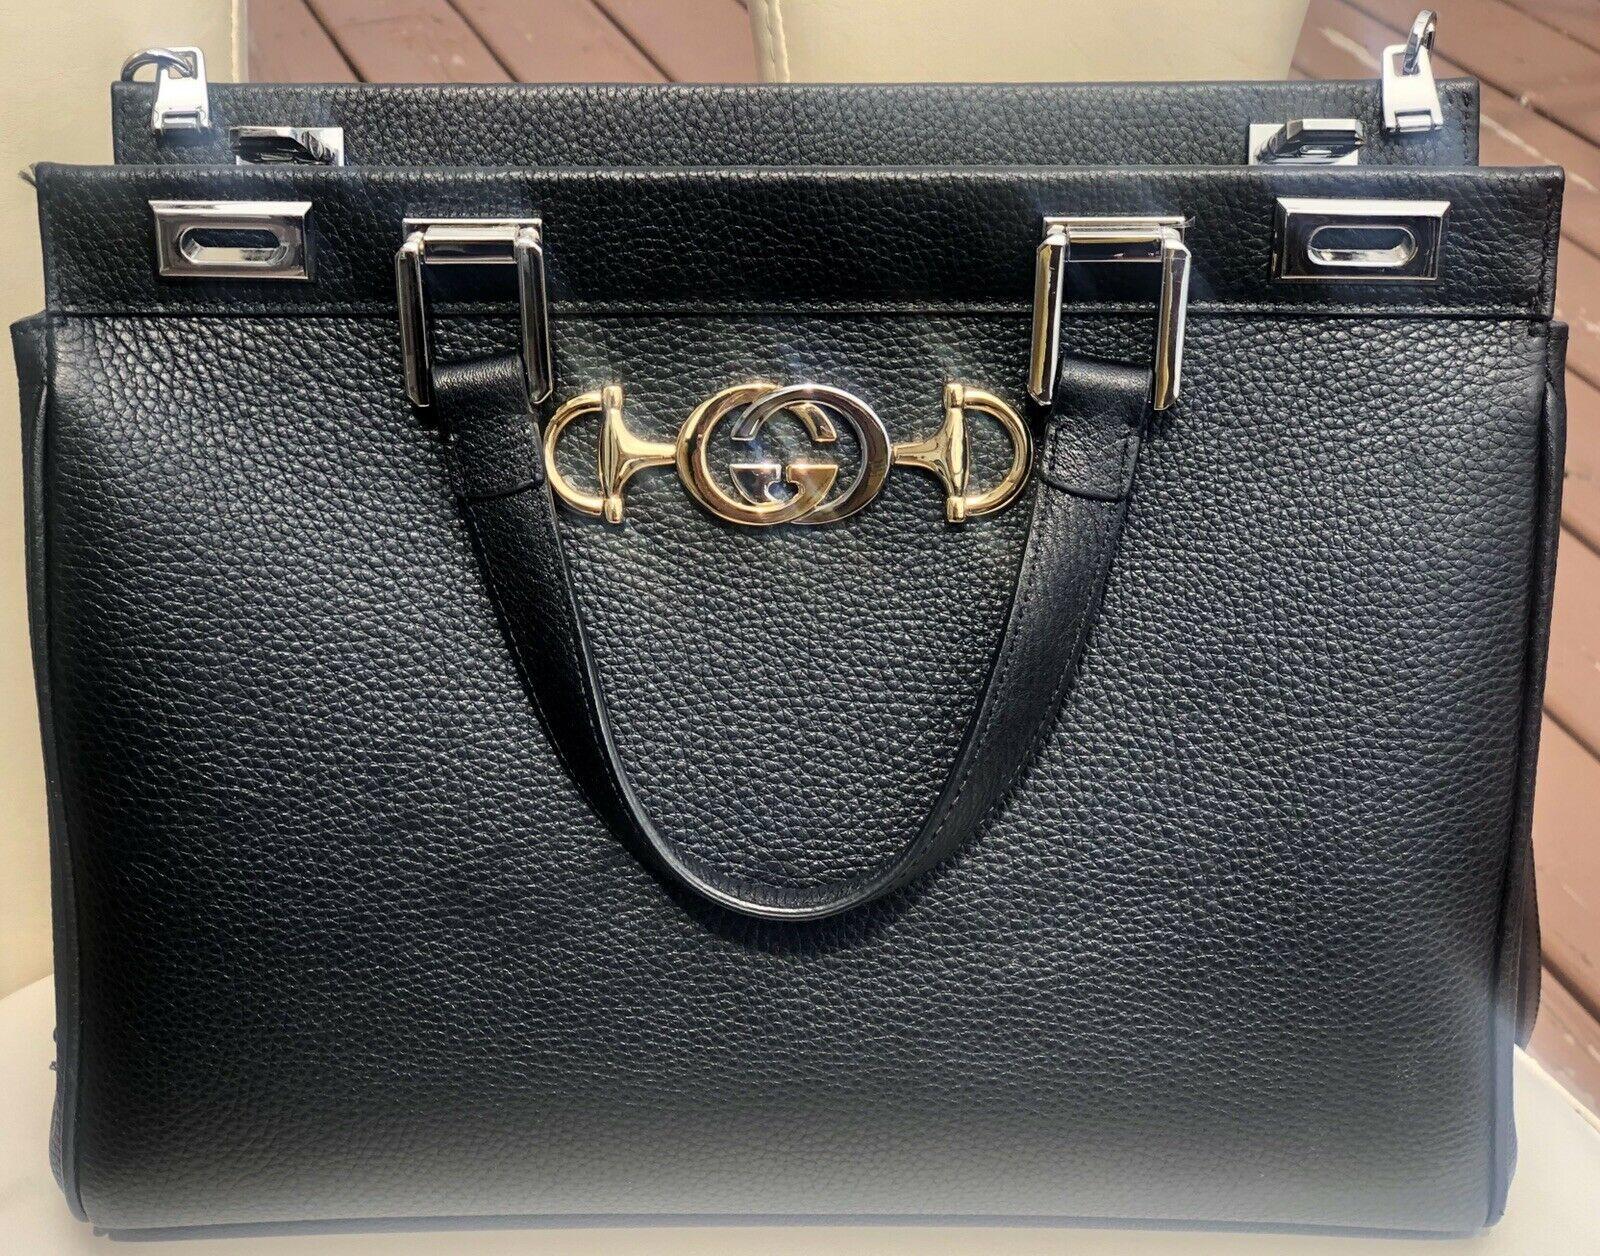 NWT GUCCI Black Zumi Grainy Leather Medium Top Handle Handbag Bag- Preloved